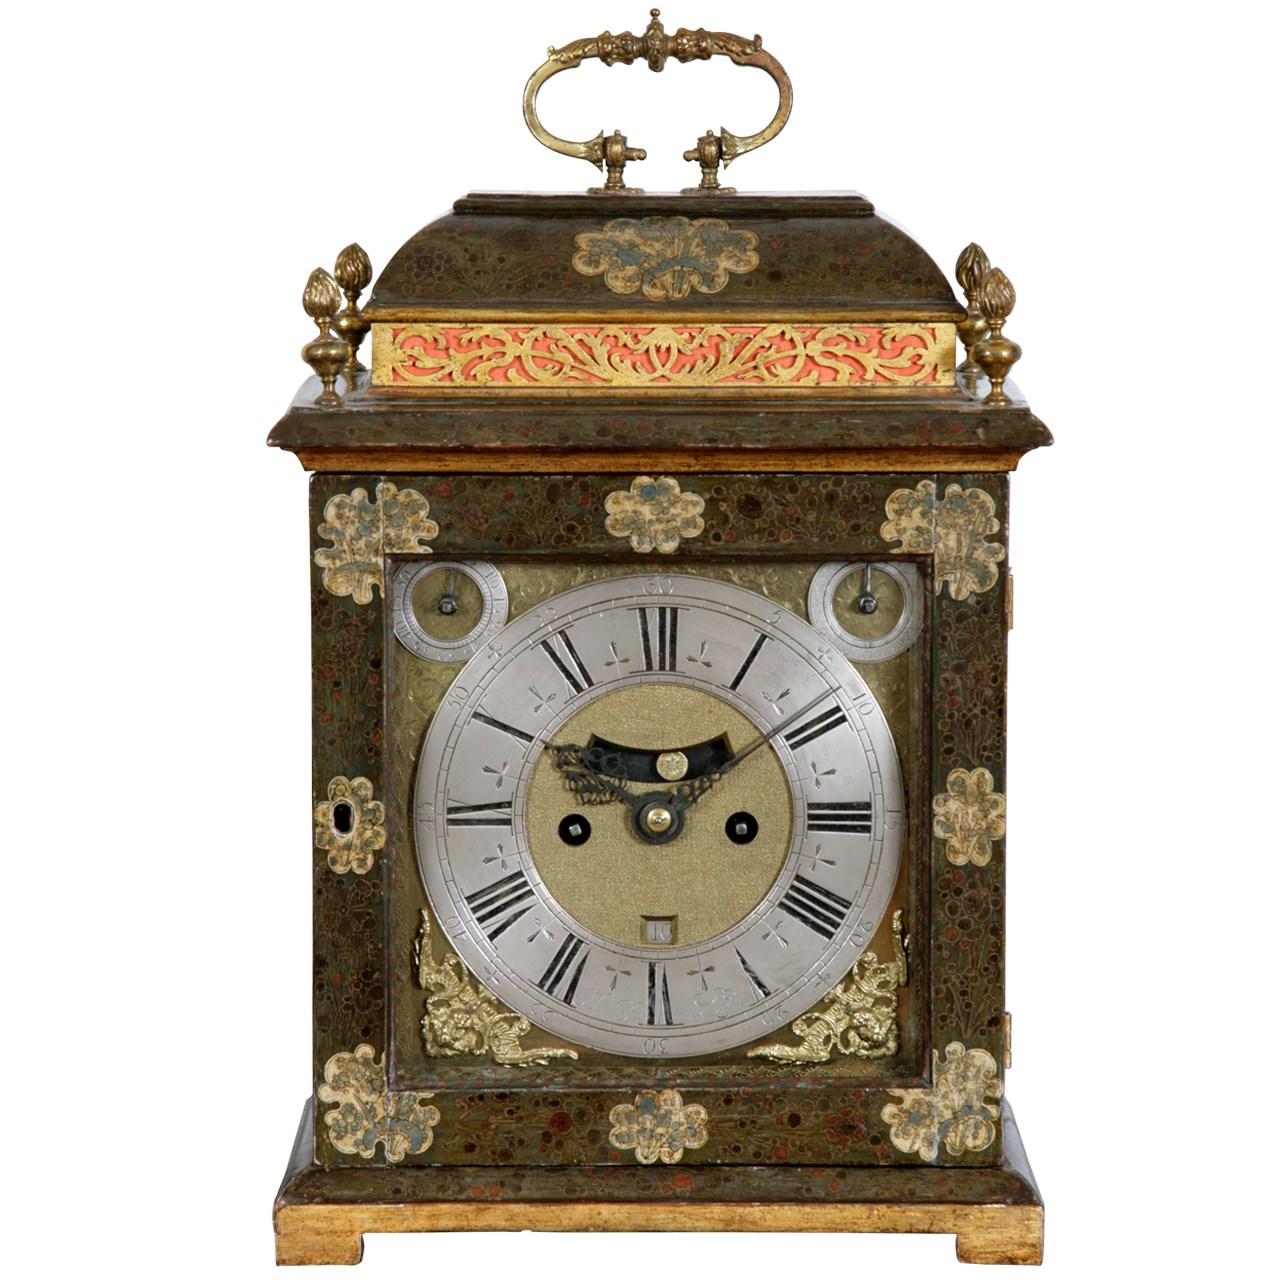 Lacquer Bracket Clock by Simon du Charmes. Circa 1695. Raffety Ltd.